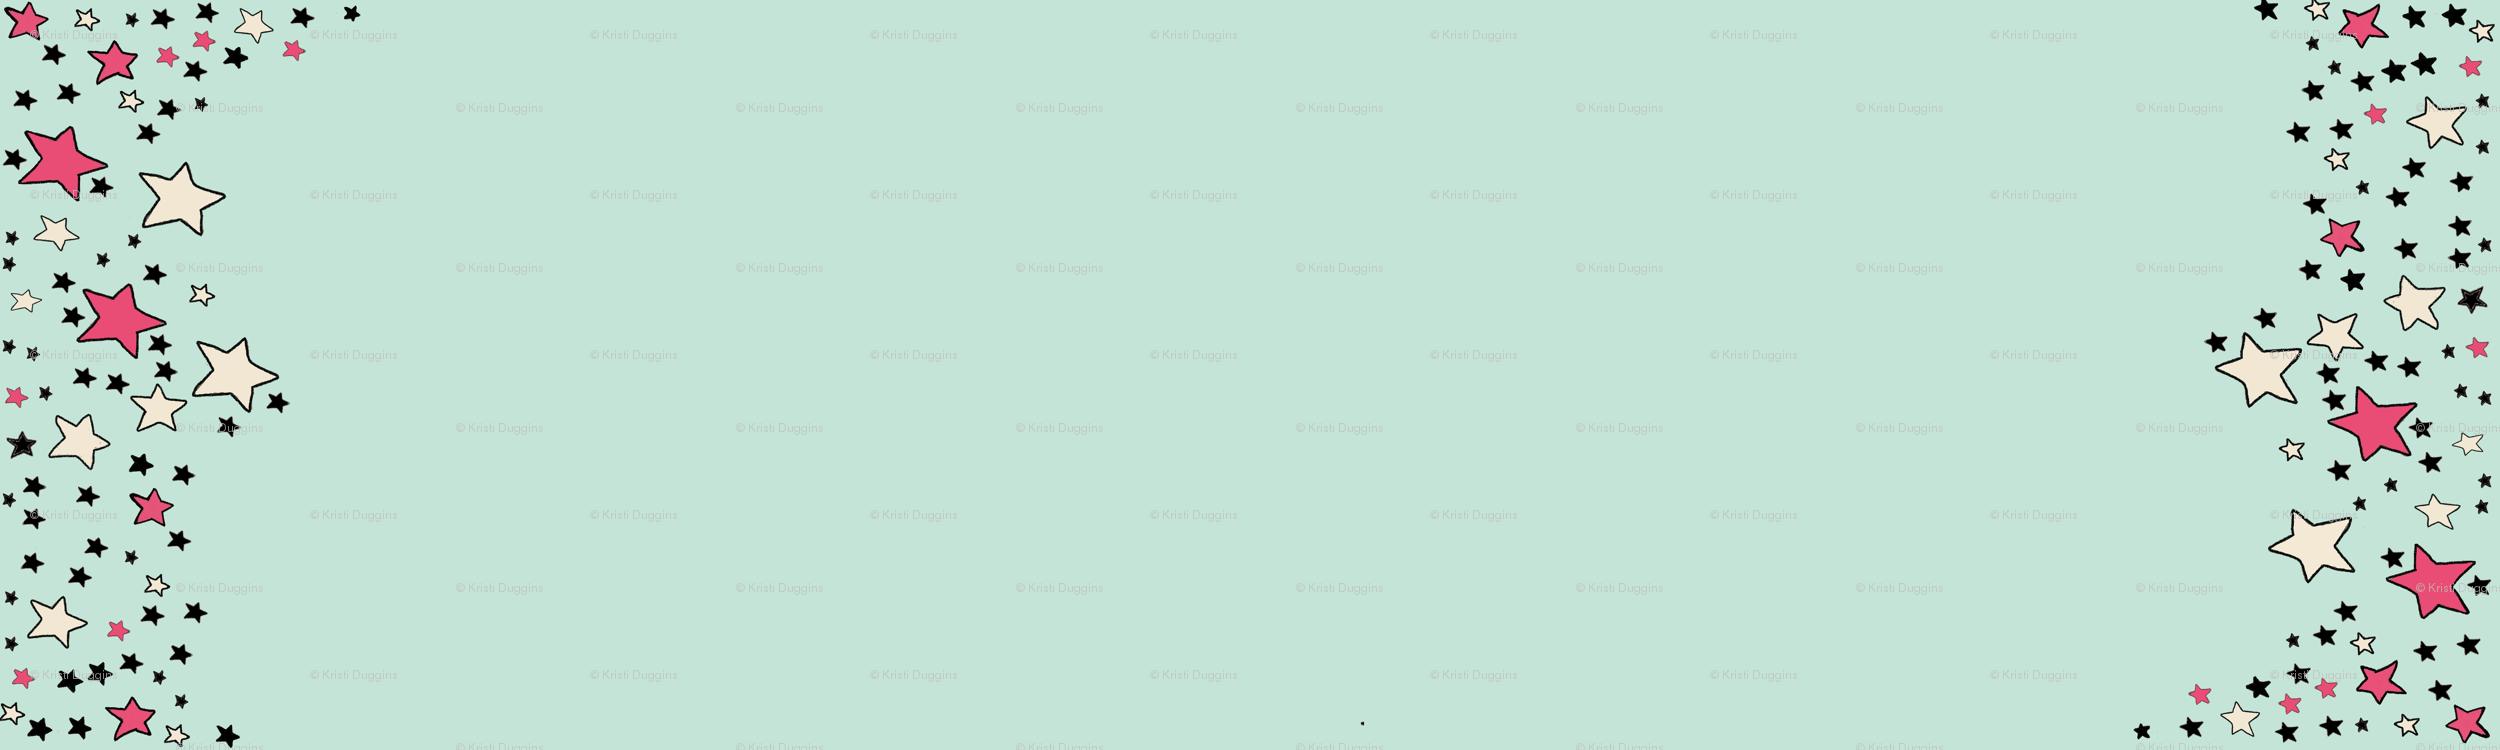 Most Inspiring Wallpaper Marble Mint Green - rrrrrrpaper_moon_border_green_colorful_stars_highres  Image_248540.png